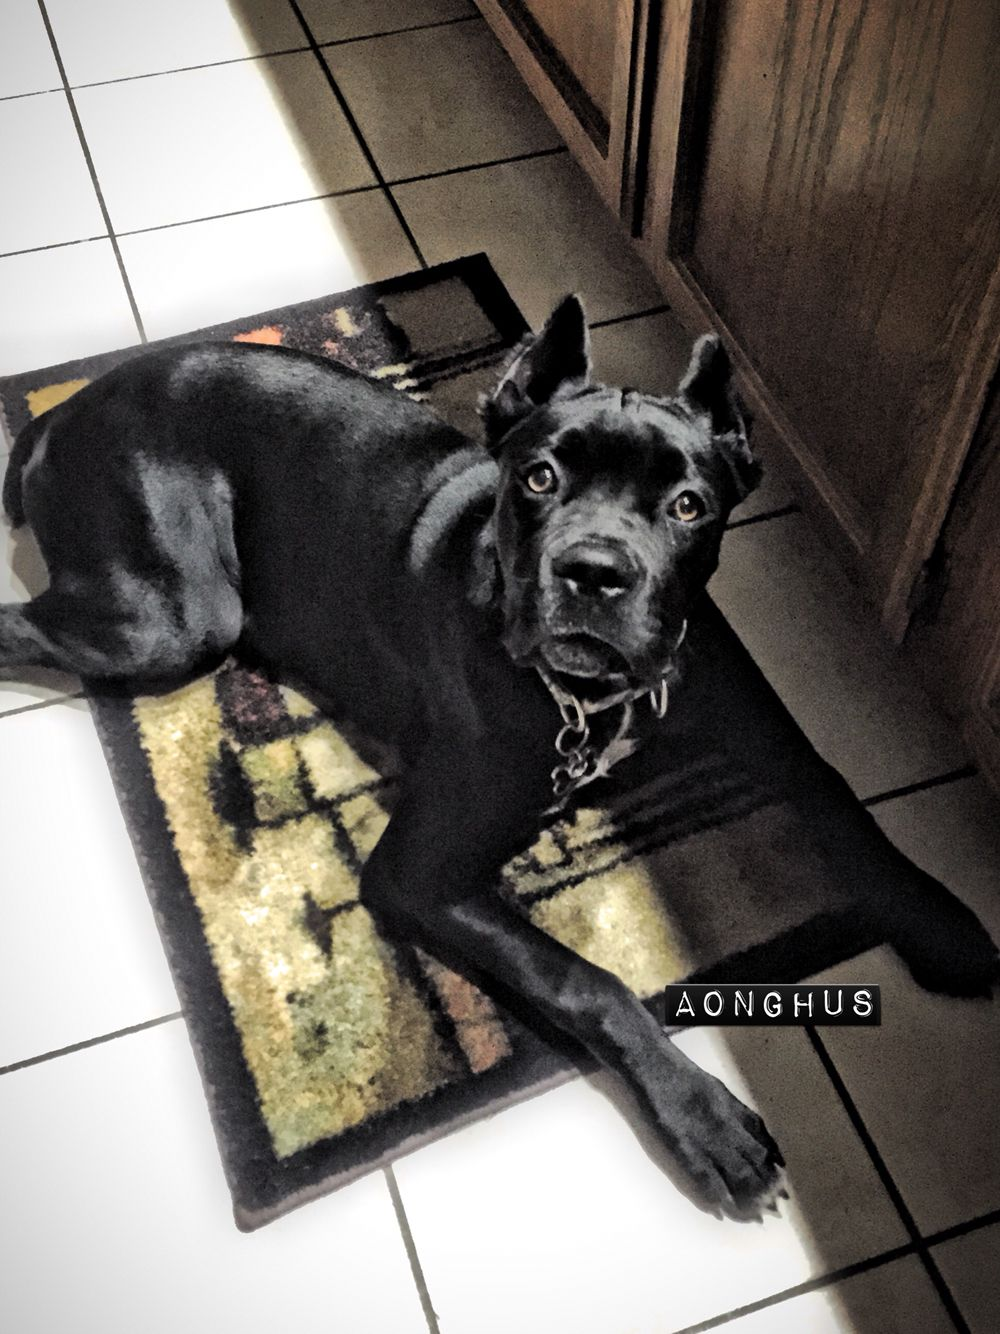 He Is So Special Cane Corso Italian Mastiff 6 Months Old Majestic Guardin Cane Corso Dog Cane Corso Mastiff Dog Breeds